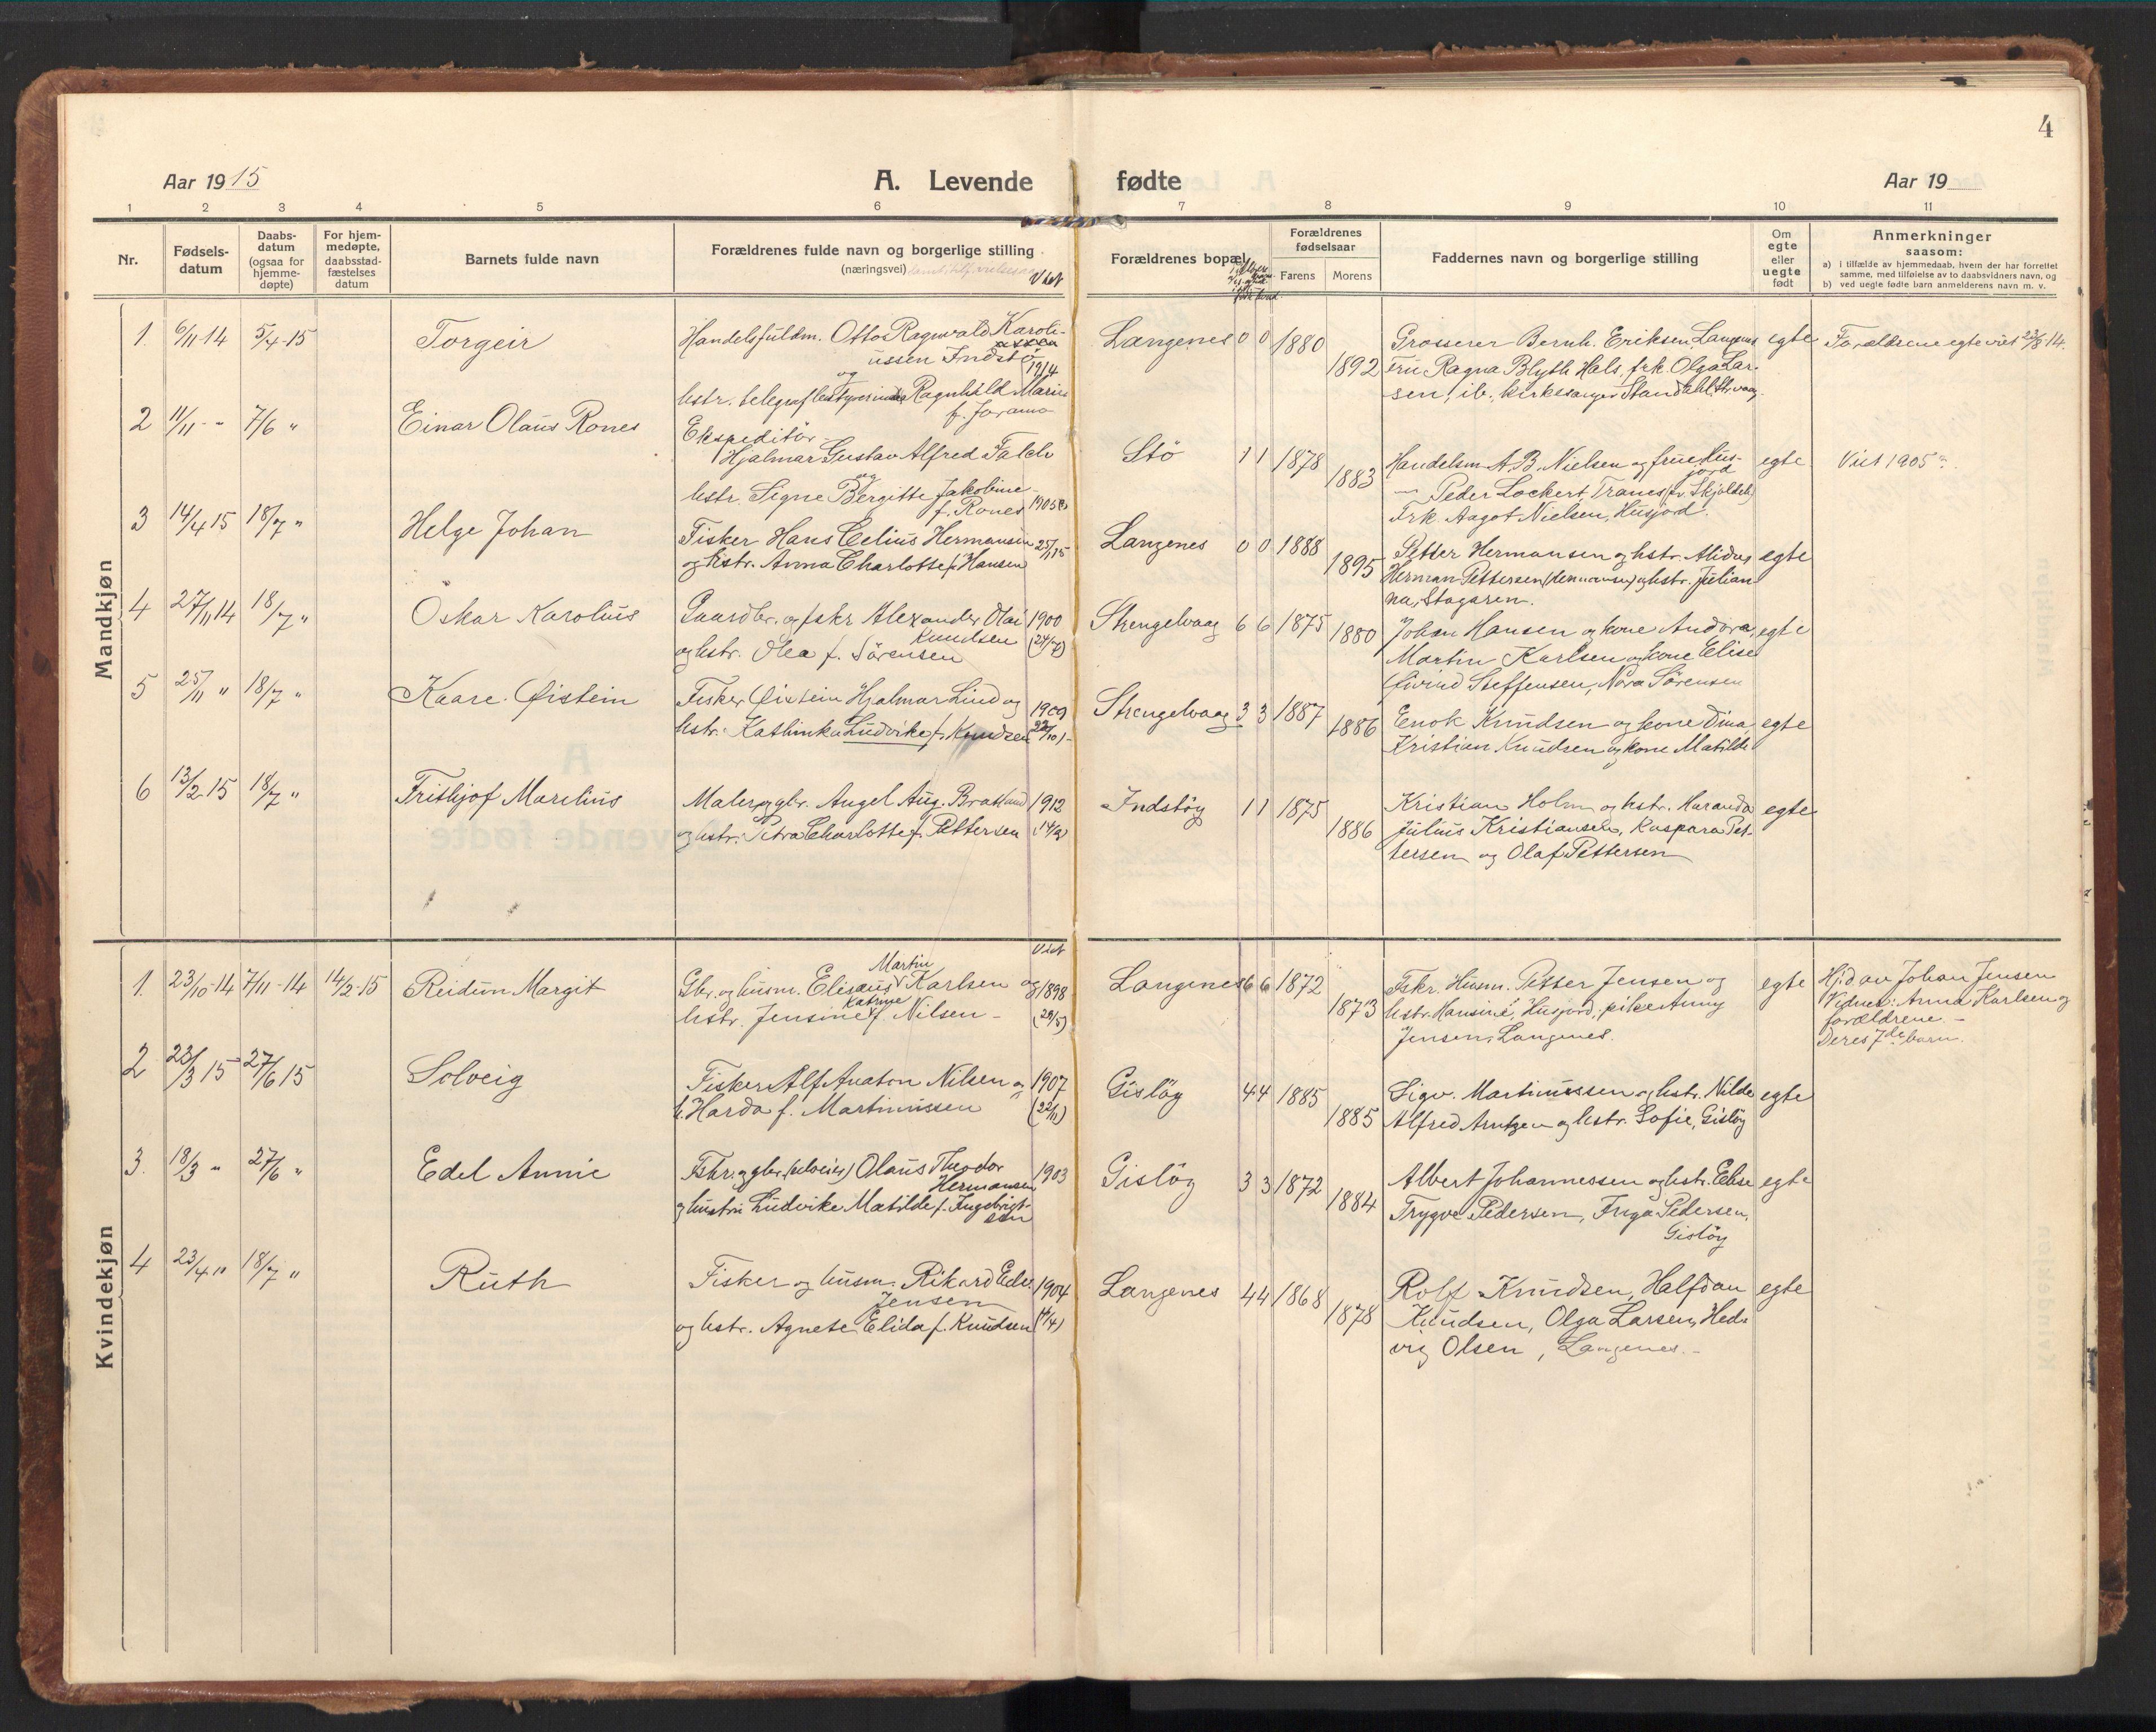 SAT, Ministerialprotokoller, klokkerbøker og fødselsregistre - Nordland, 894/L1357: Ministerialbok nr. 894A03, 1913-1934, s. 4